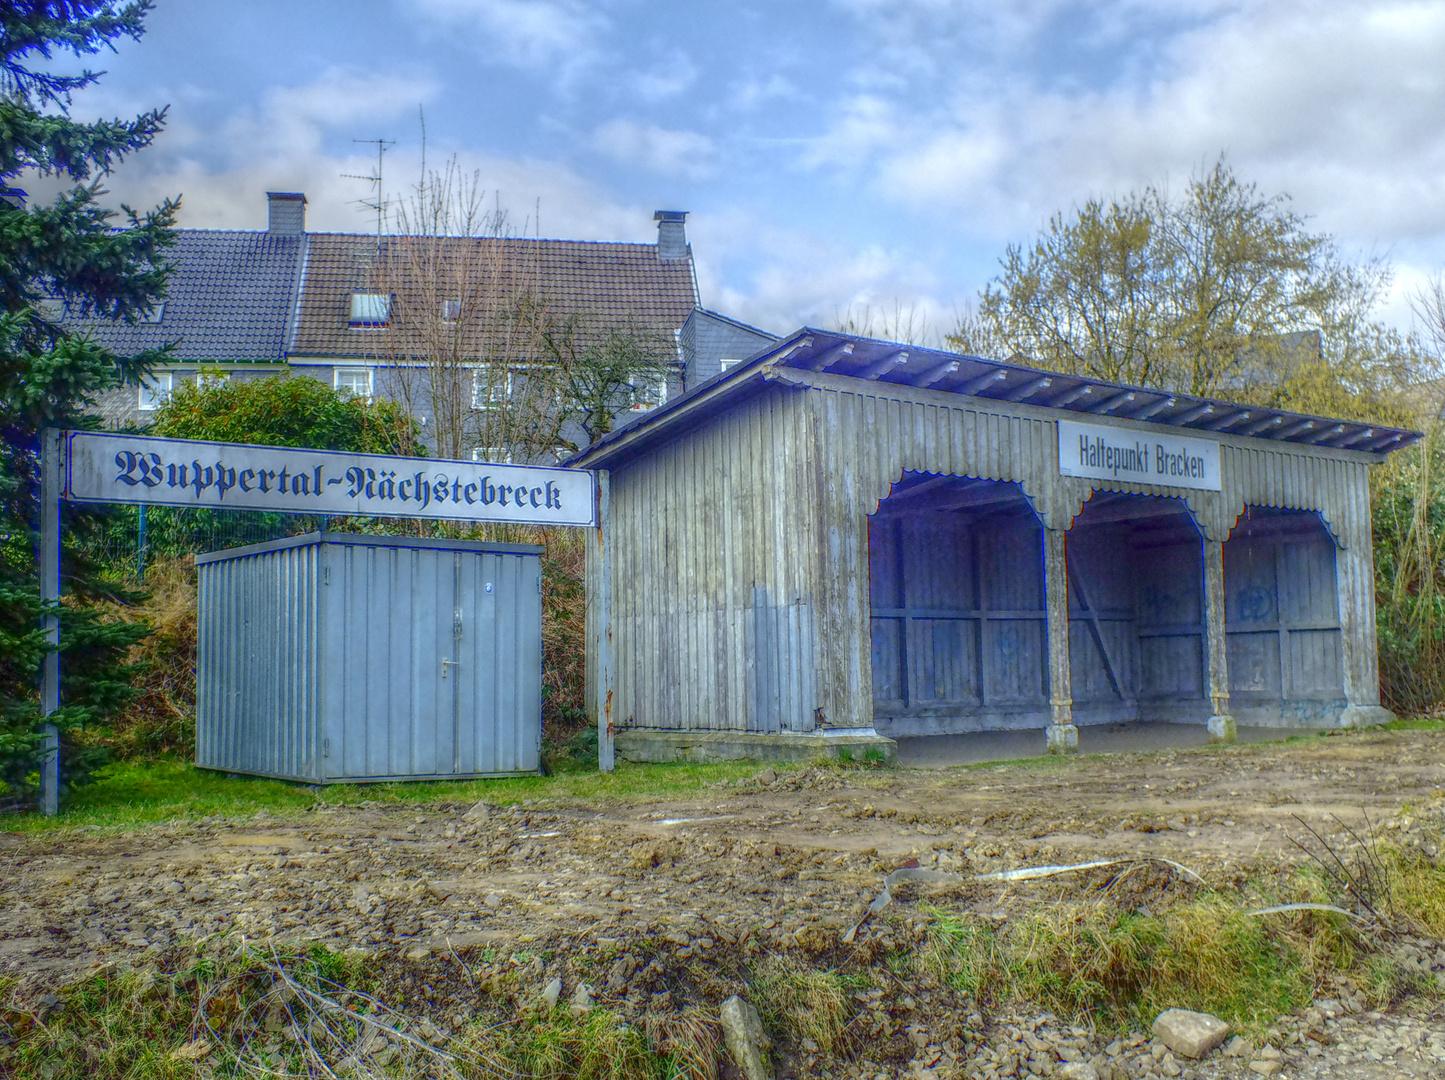 Haltestelle Wuppertal-Nächstebreck